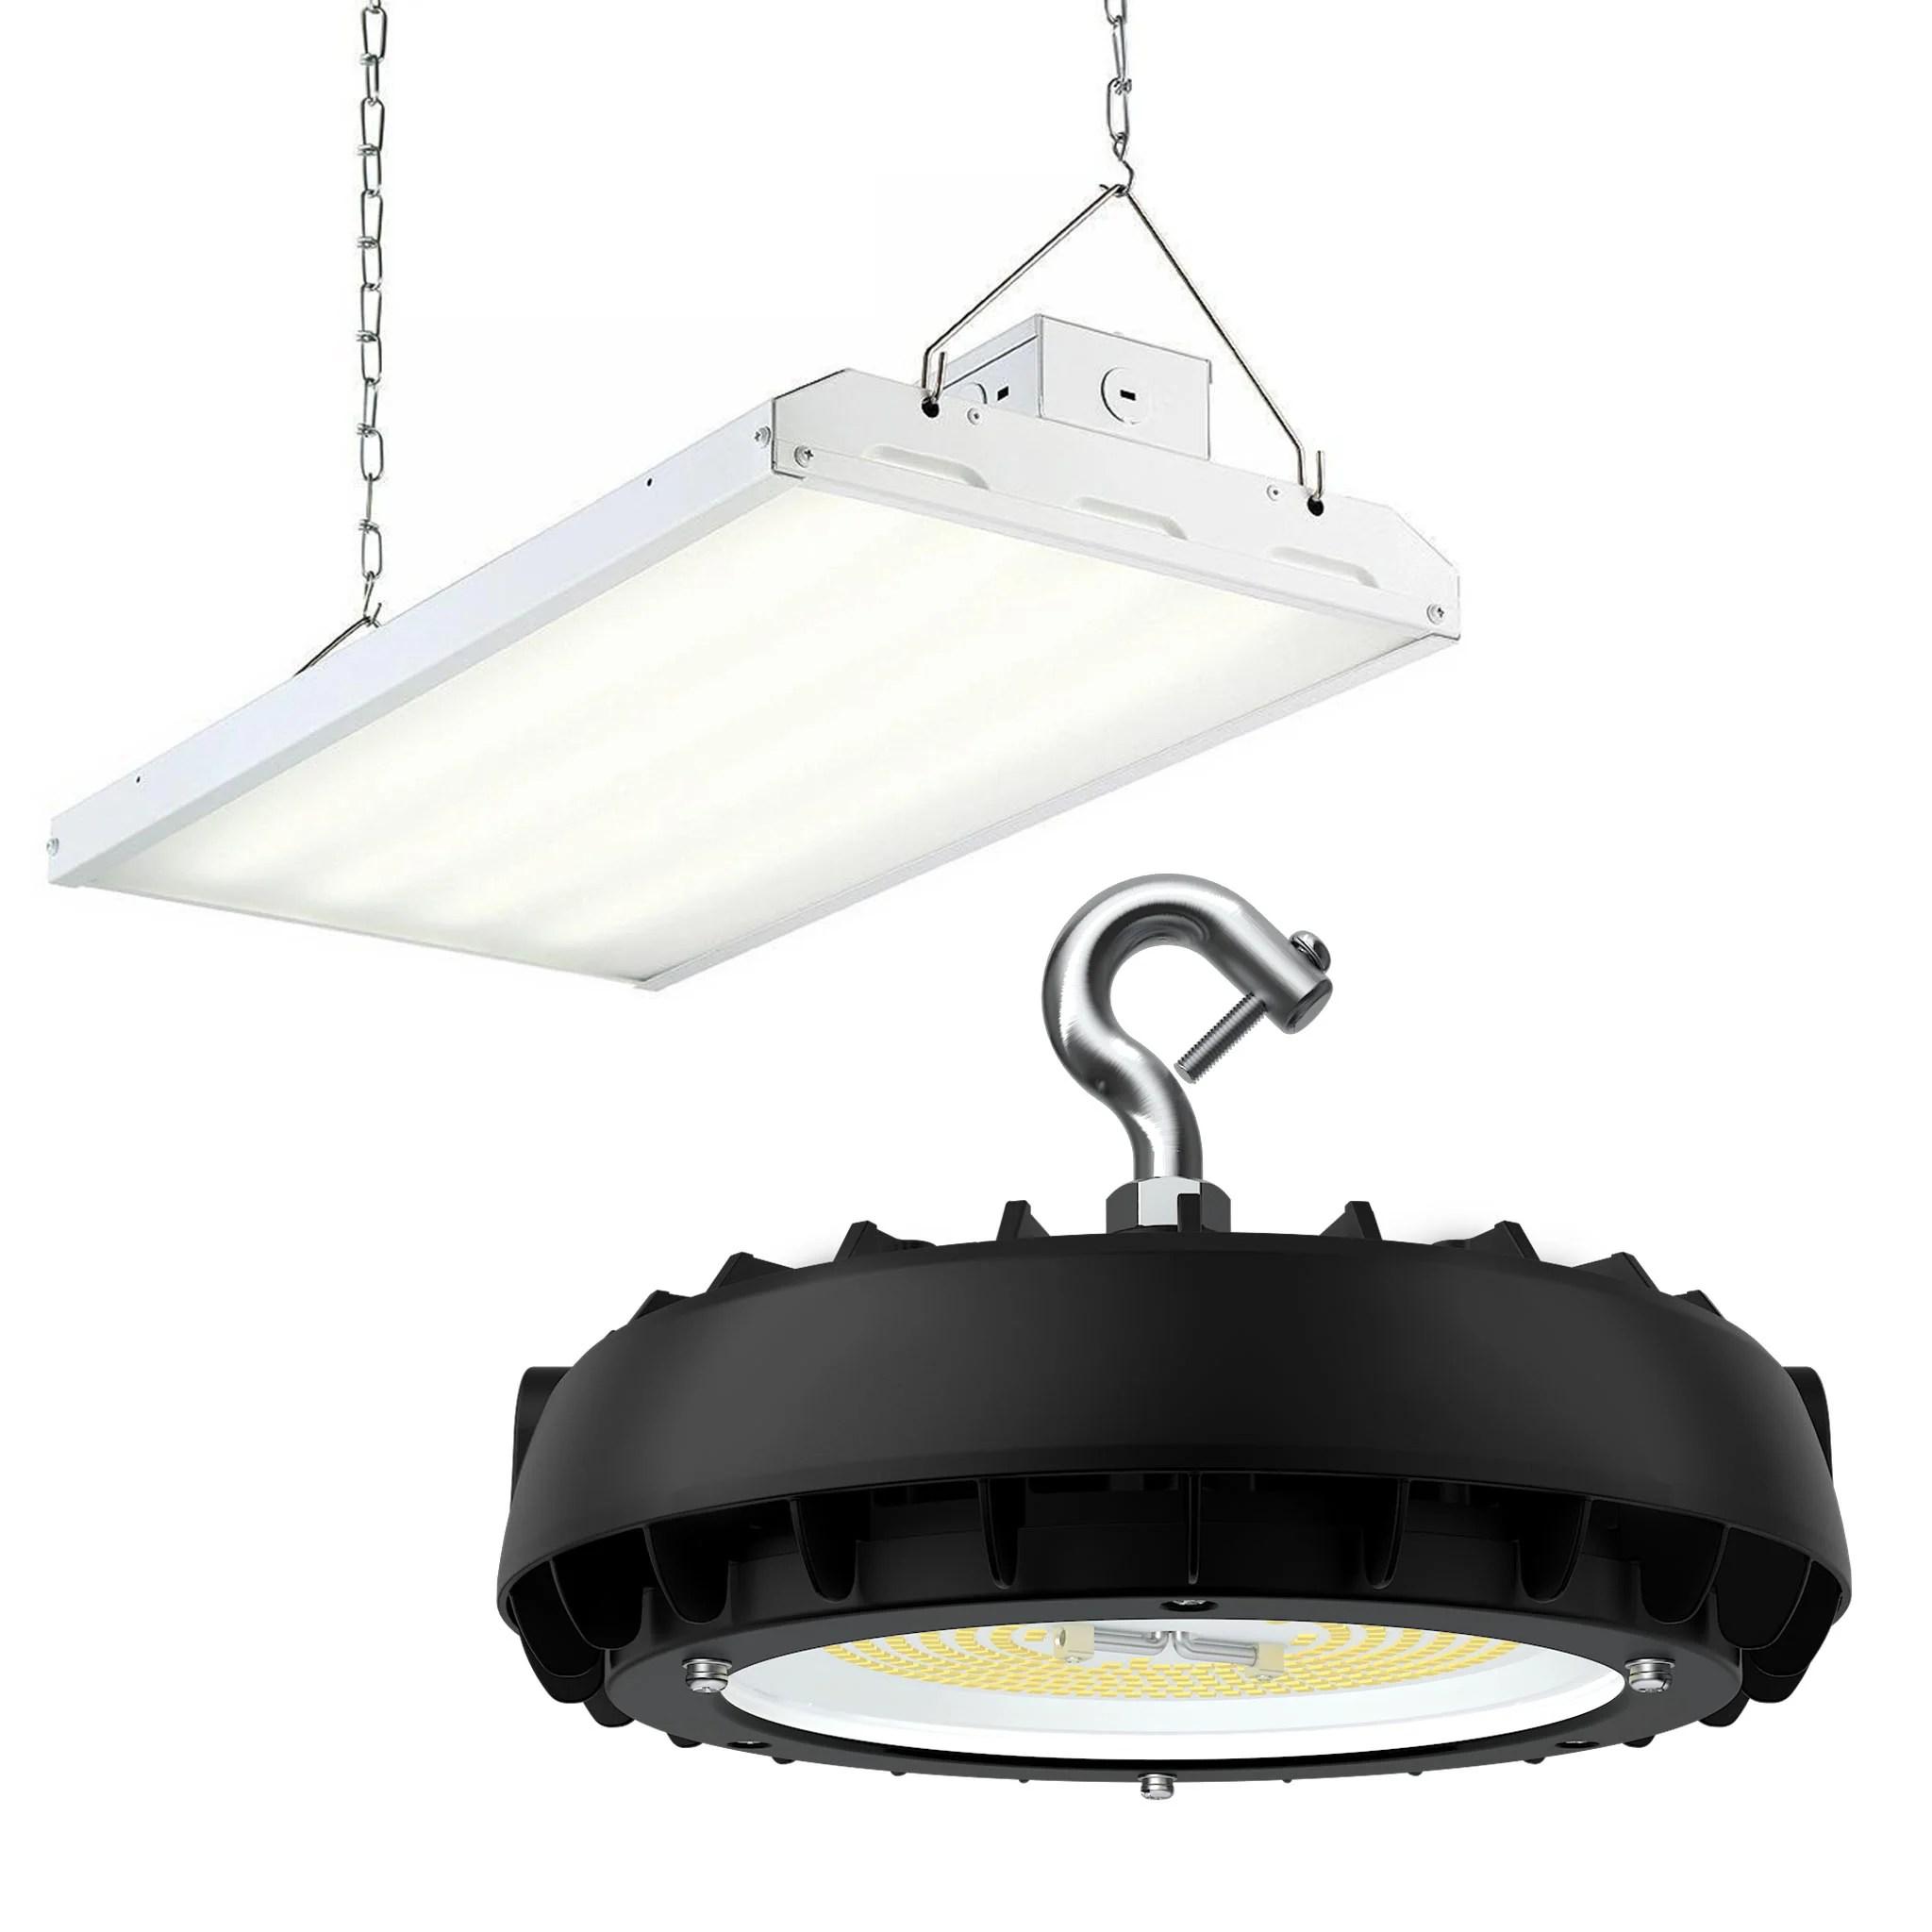 small resolution of high bay lights lighting fixtures